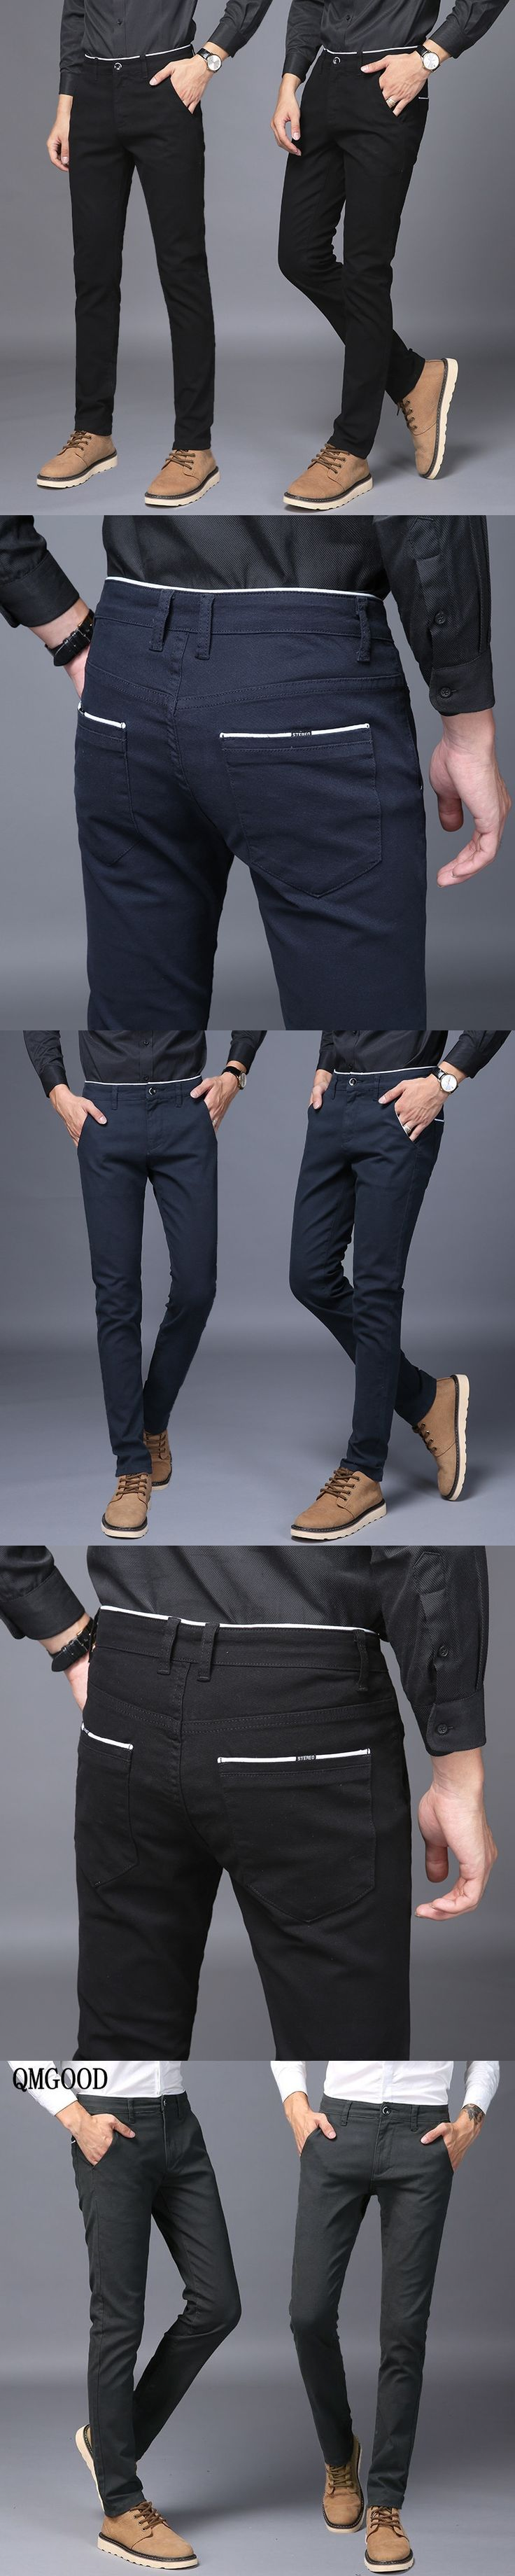 QMGOOD 2017 Hot Sales Mens Pants Cotton Slant Pocket Slim Straight Trousers Elasticity Stretch Fashion Pants Business Casual